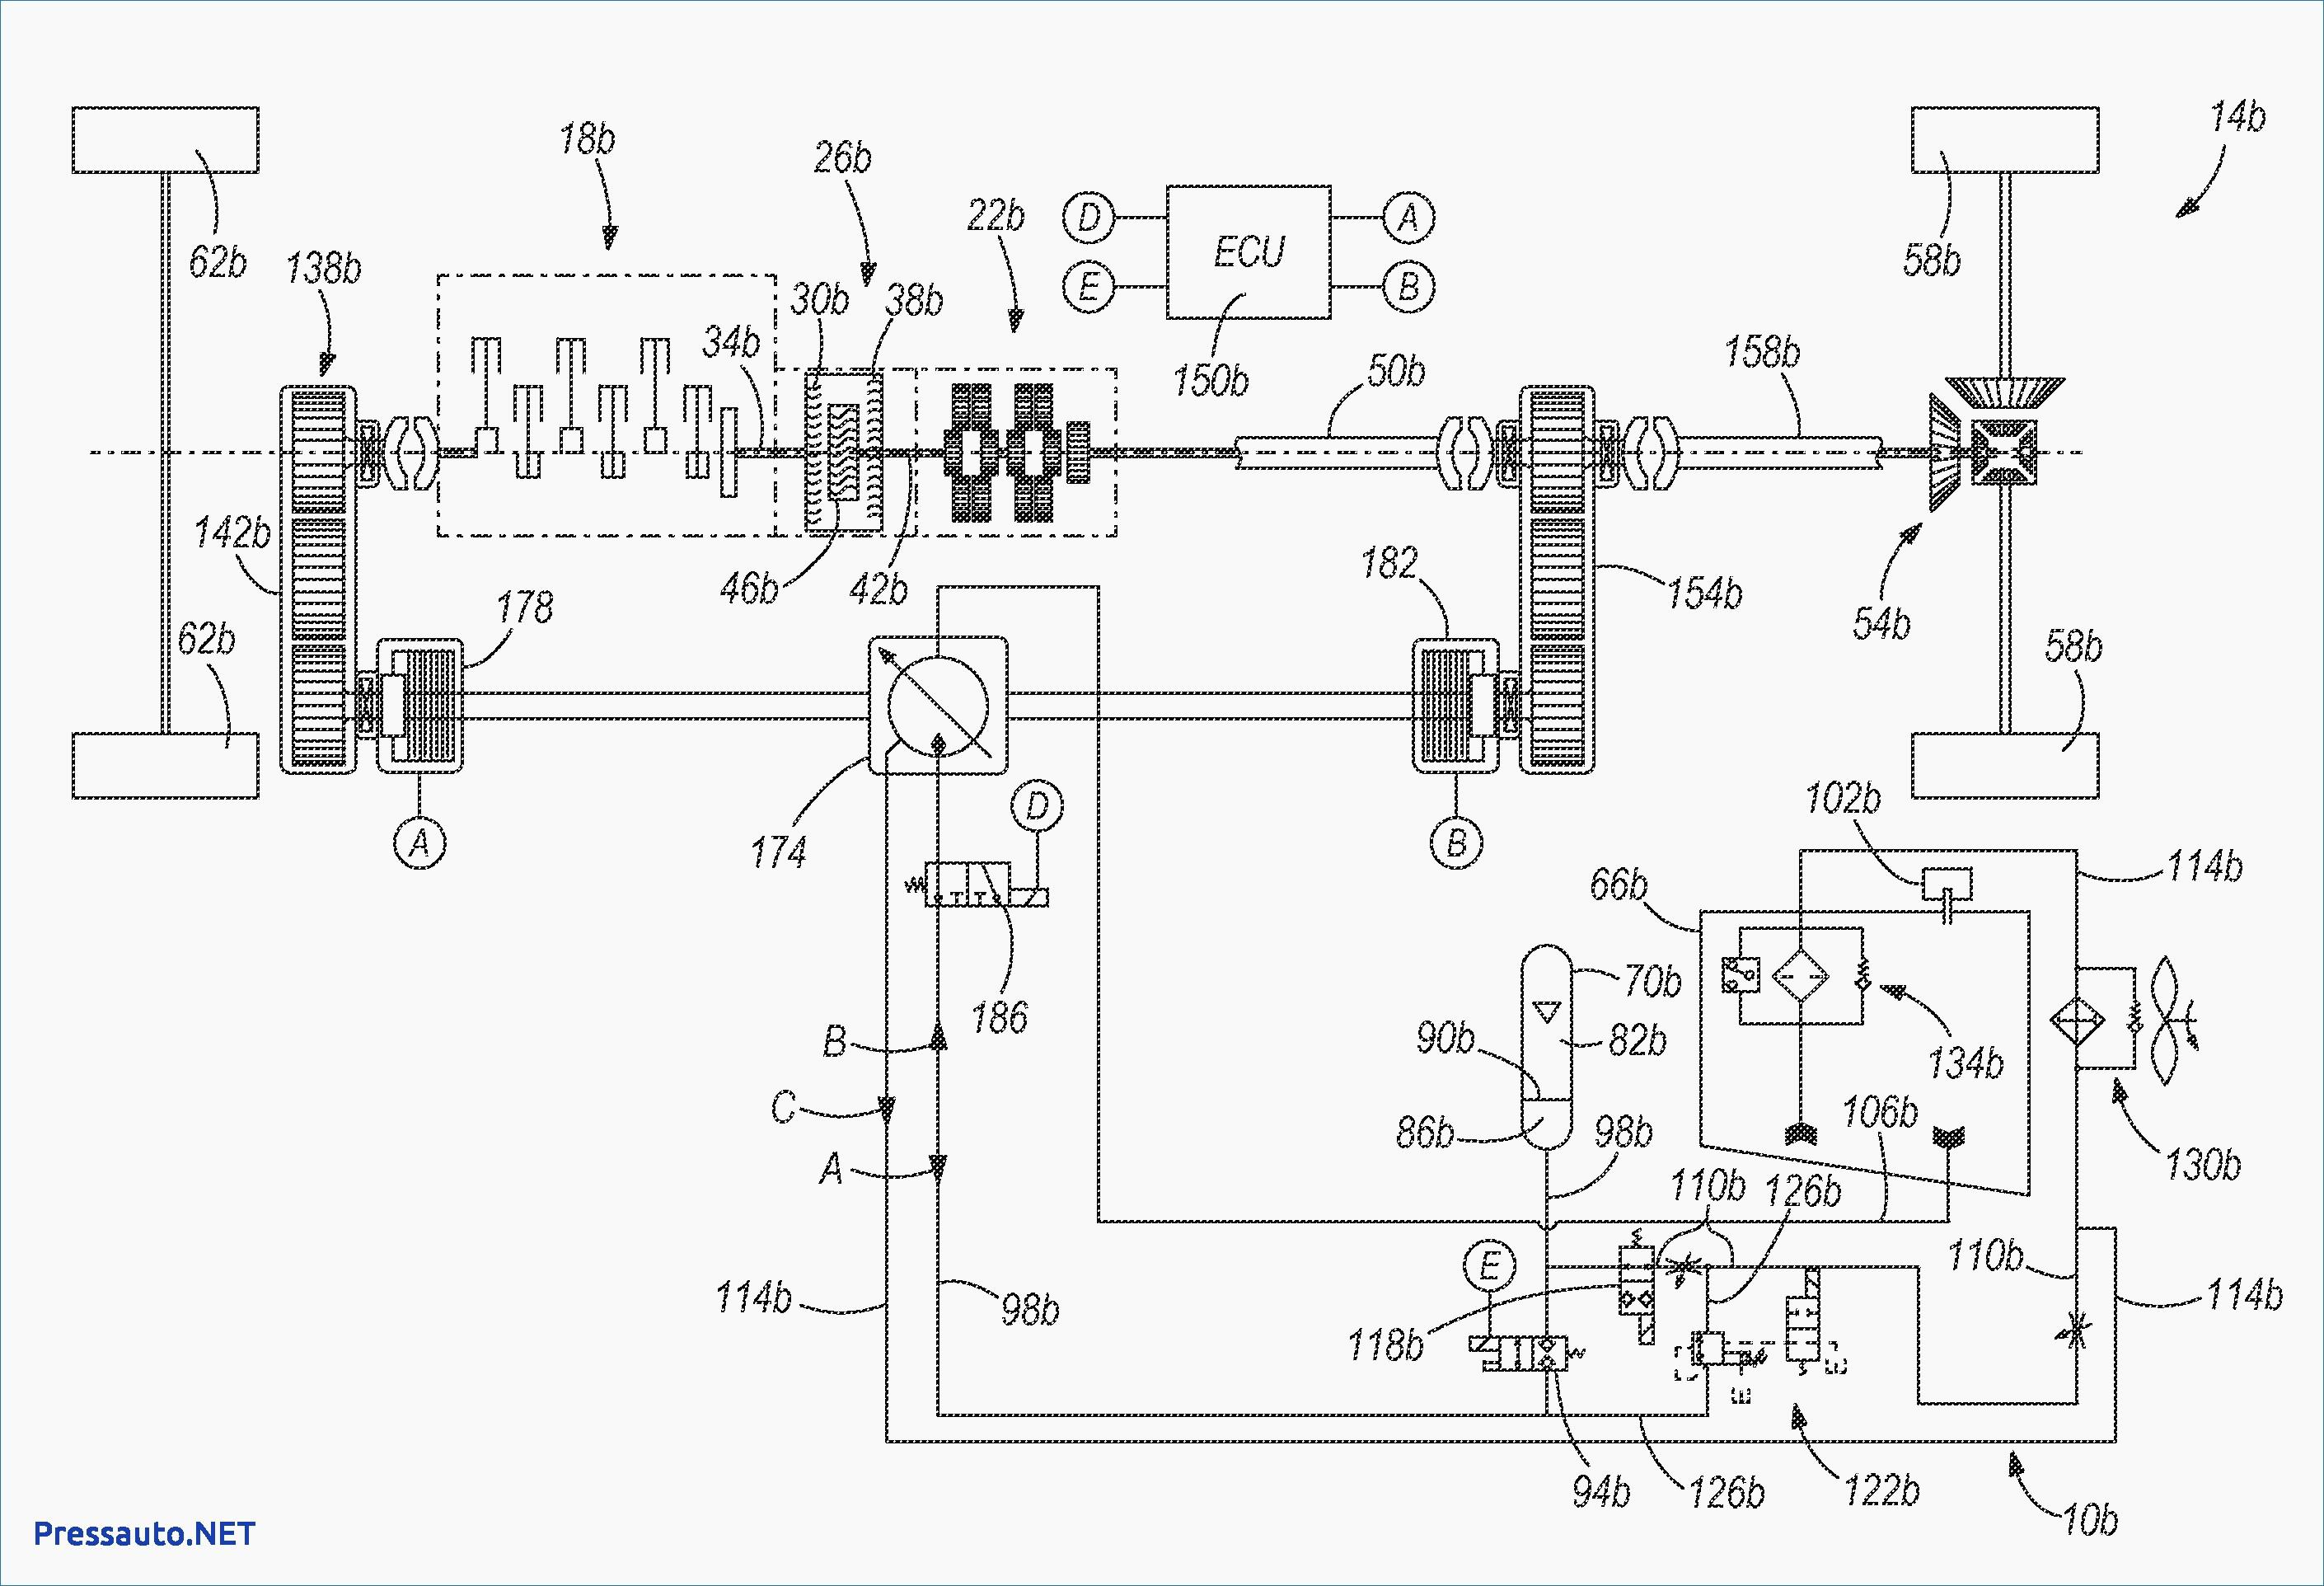 [DIAGRAM] 2009 Fleetwood Wiring Diagram FULL Version HD